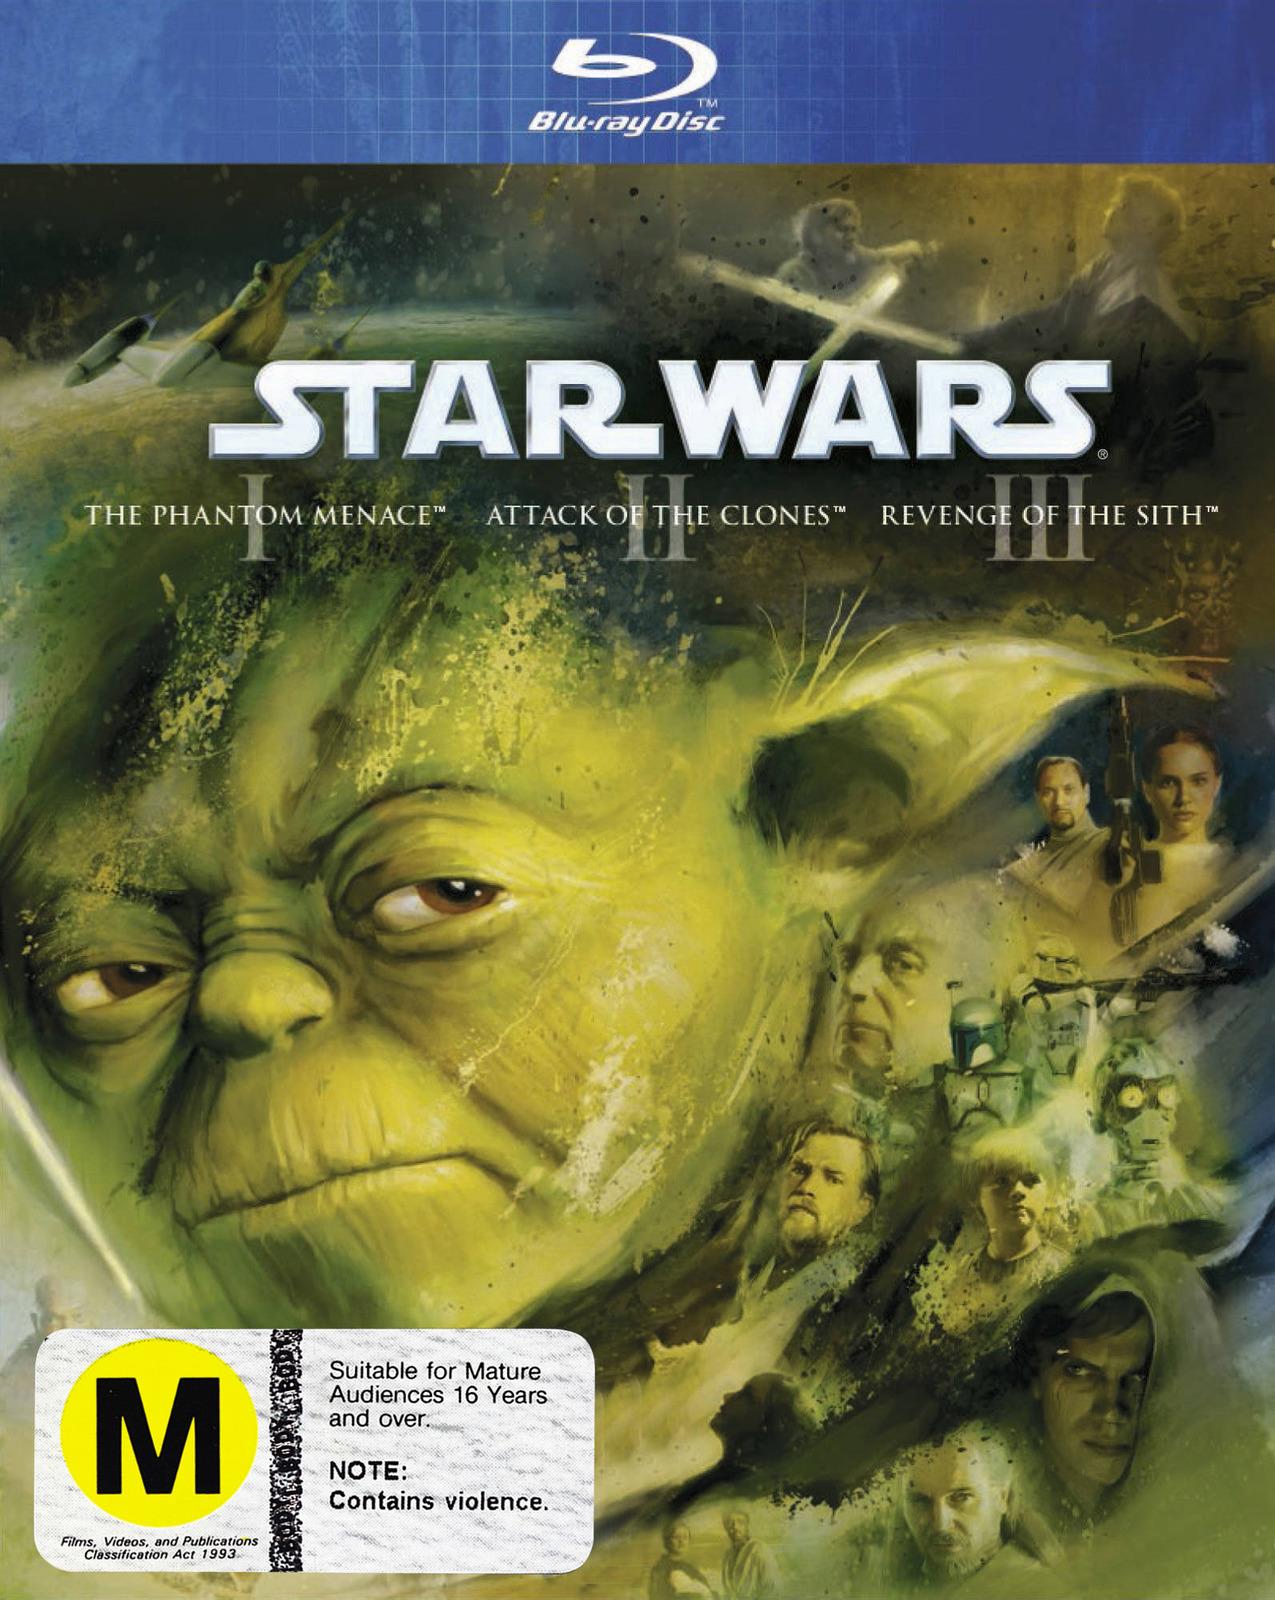 Star Wars I, II, III (Prequel Trilogy) on Blu-ray image